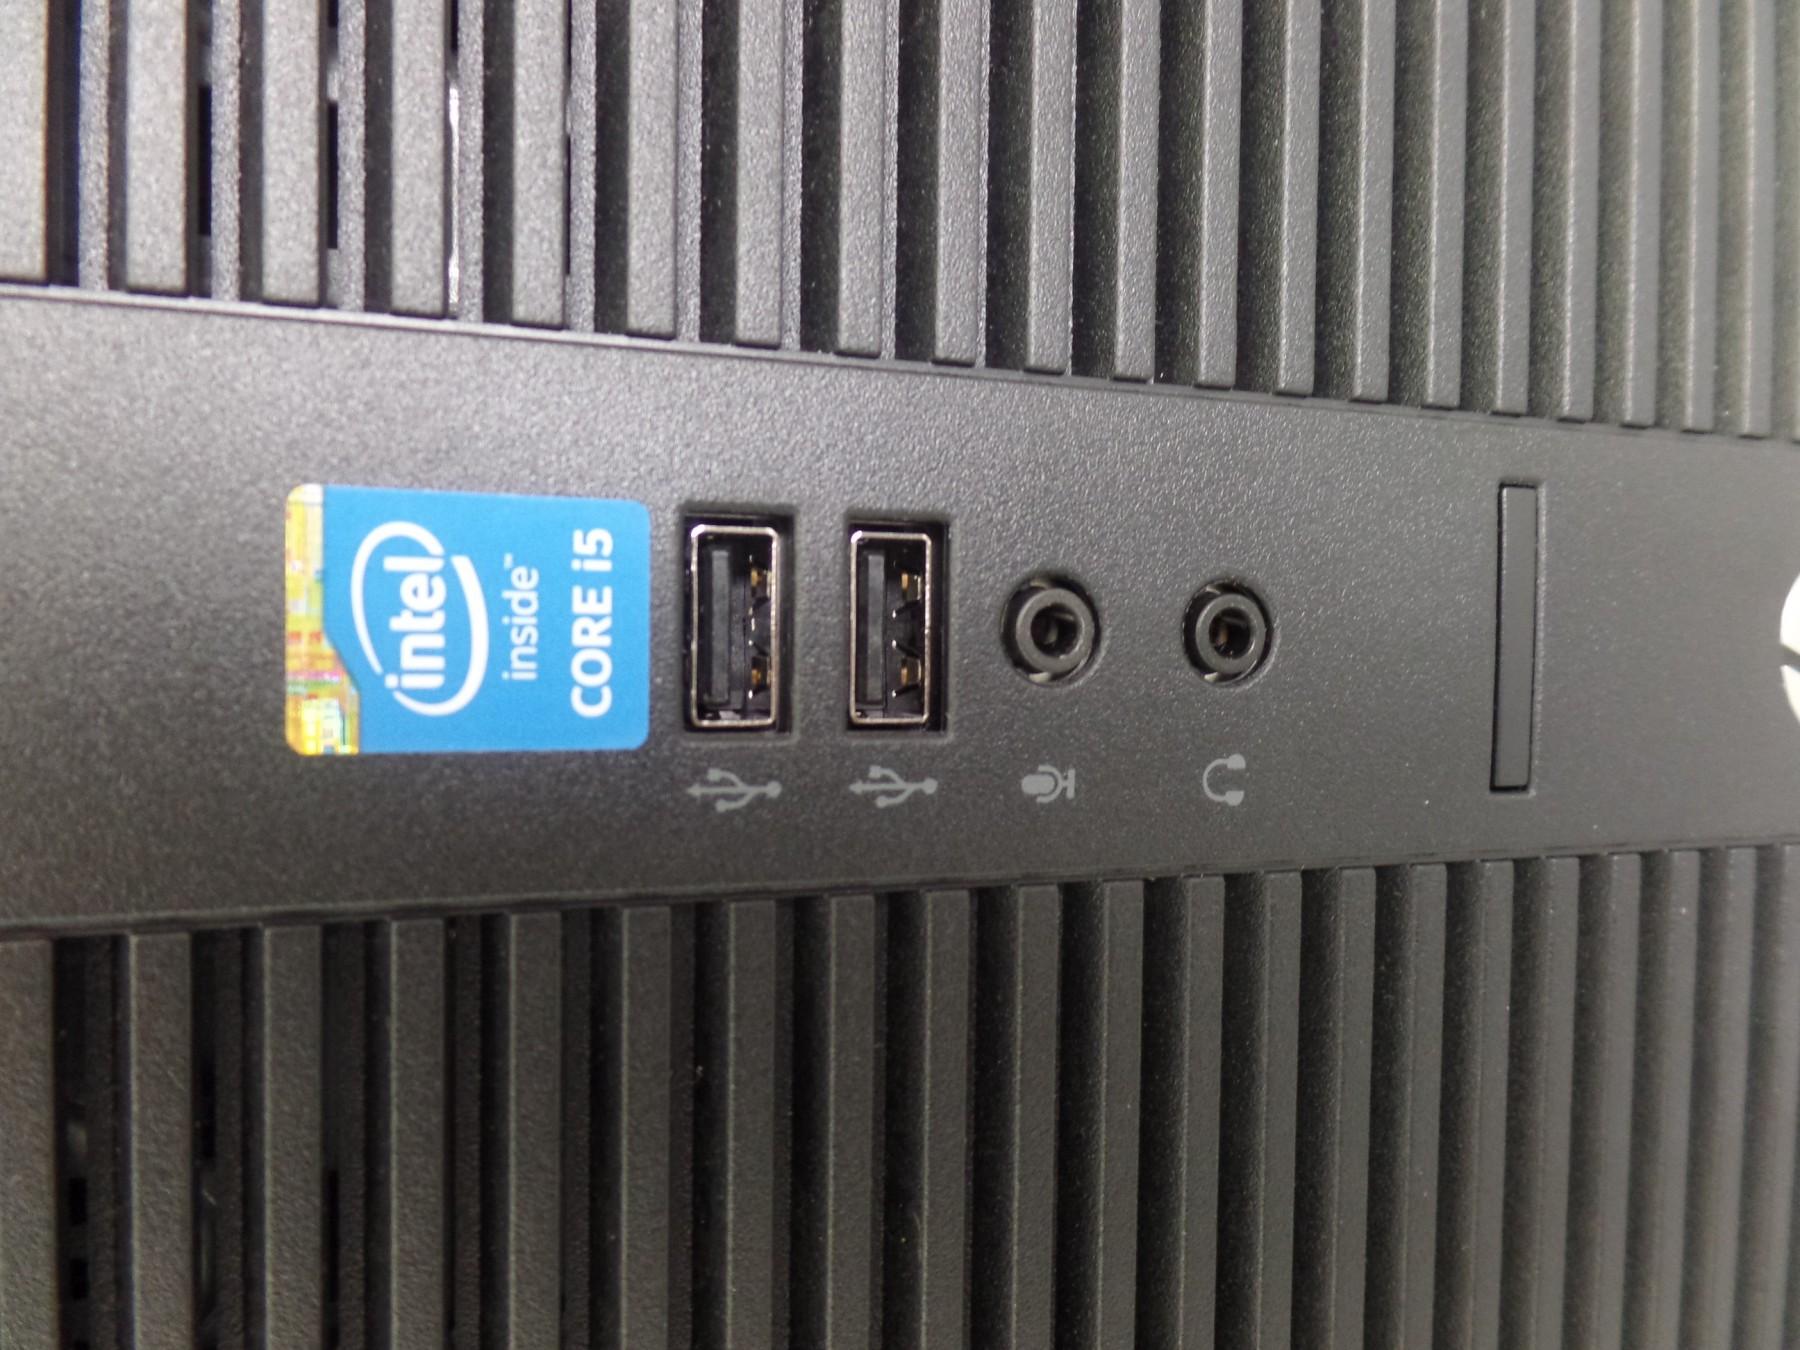 HP 280 G1 Tower Desktop PC Core i5-4590S 3GHz 4GB 500GB Win 7 Pro P0C88UT  cosm